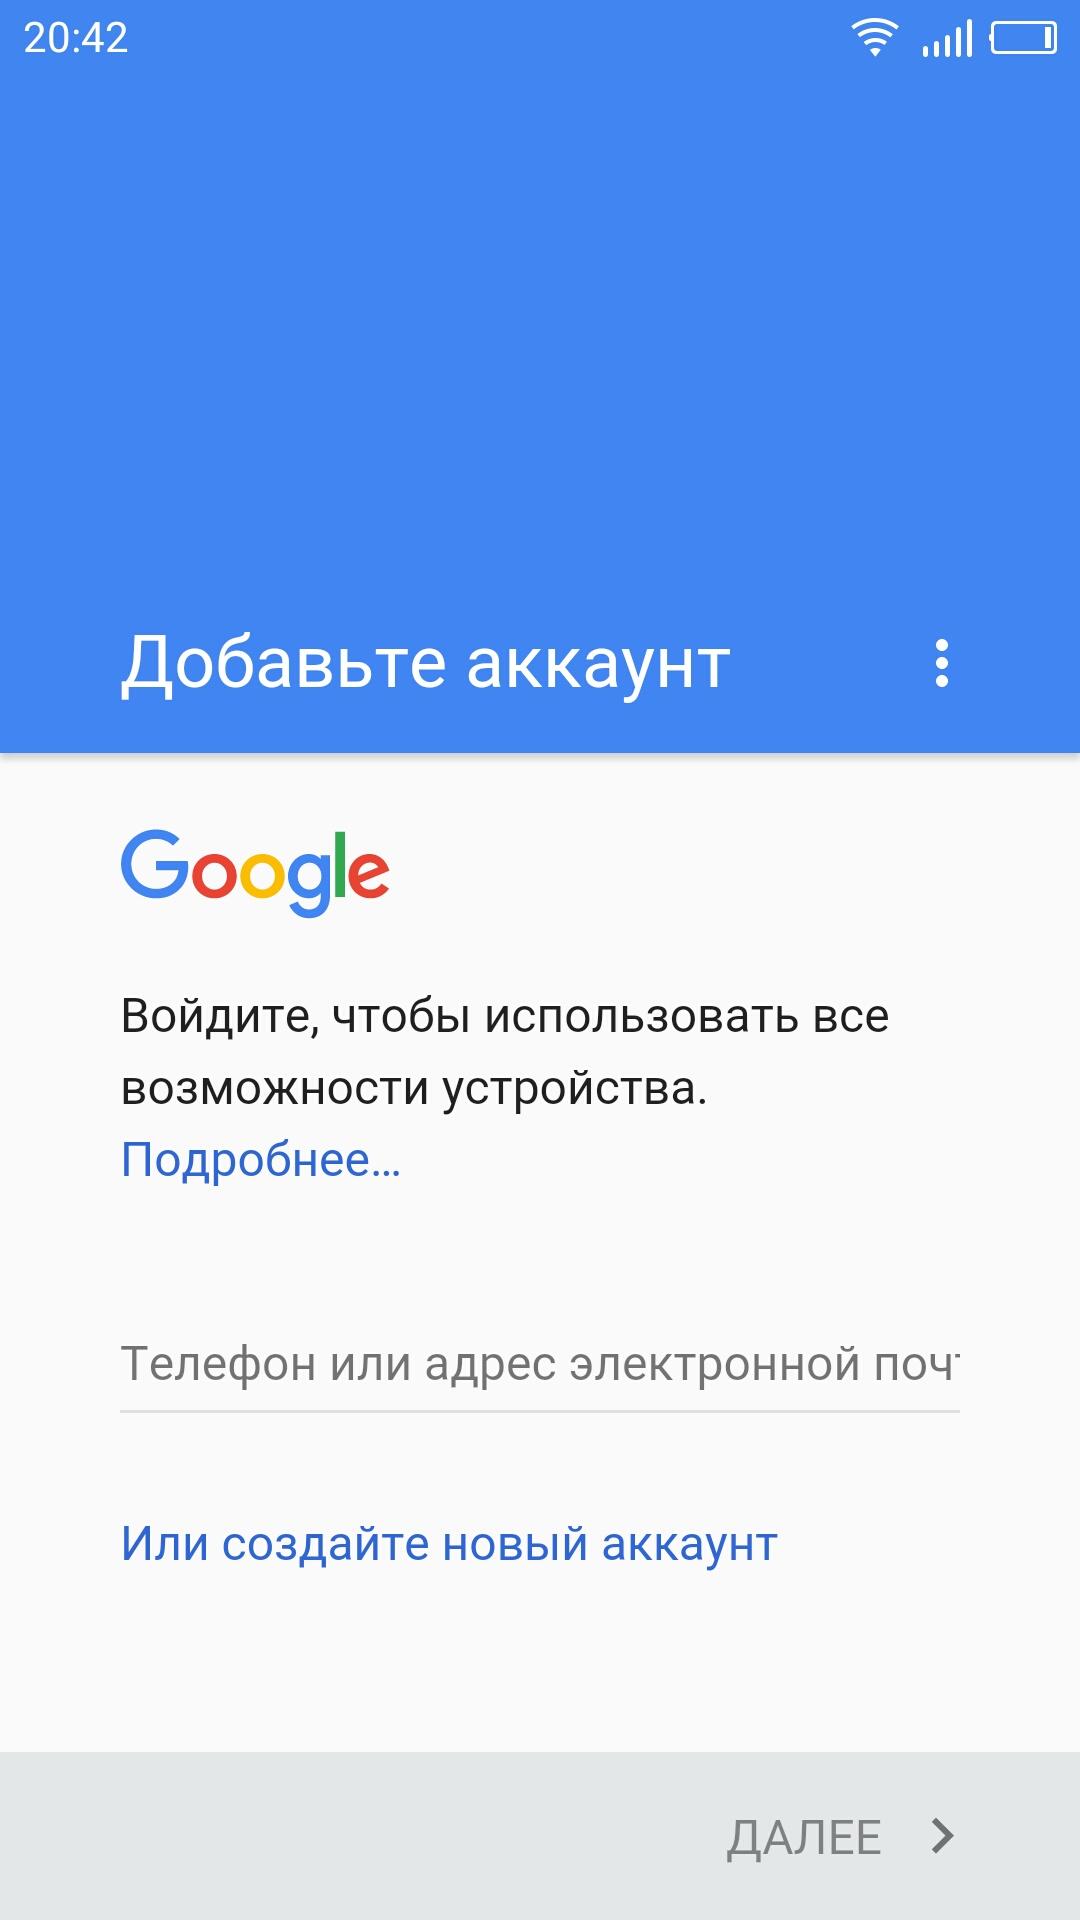 Вход в аккаунт гугл